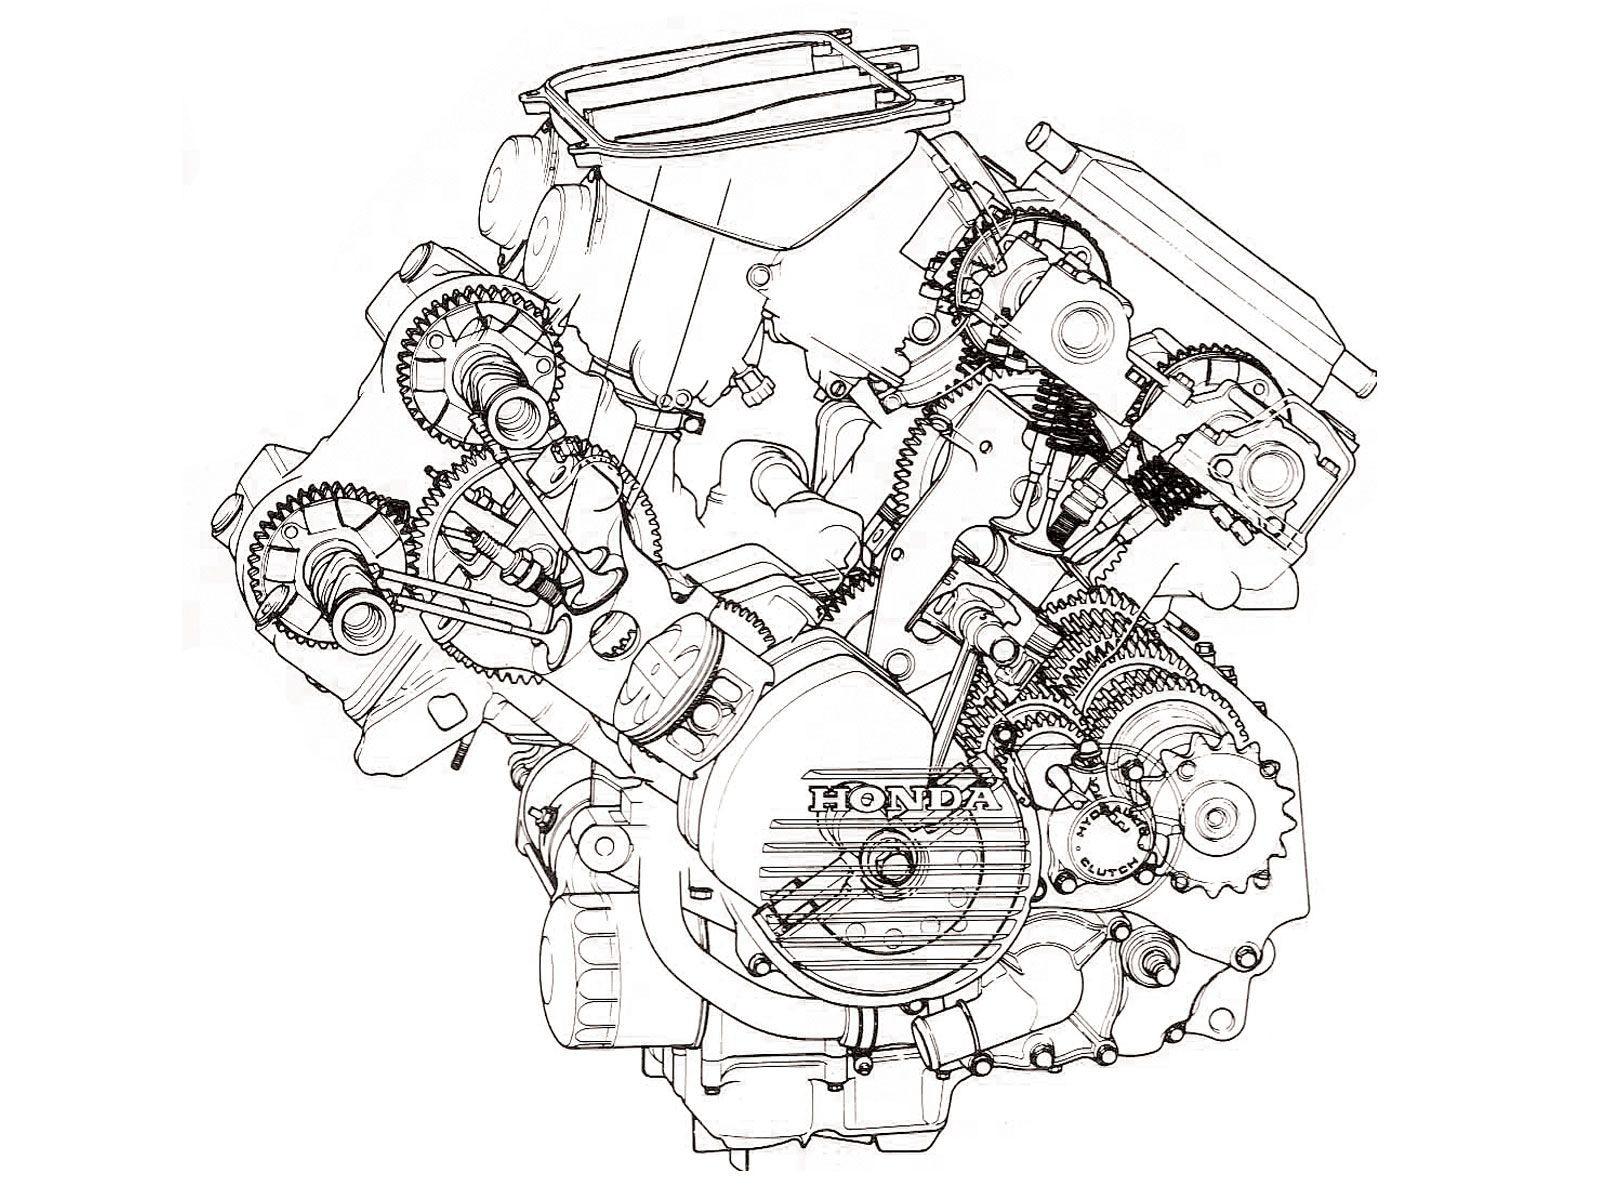 How Bike Engine Works with Diagram 1986 Honda Vfr750fg Interceptor V4 Motor Shot Geared Cams Of How Bike Engine Works with Diagram